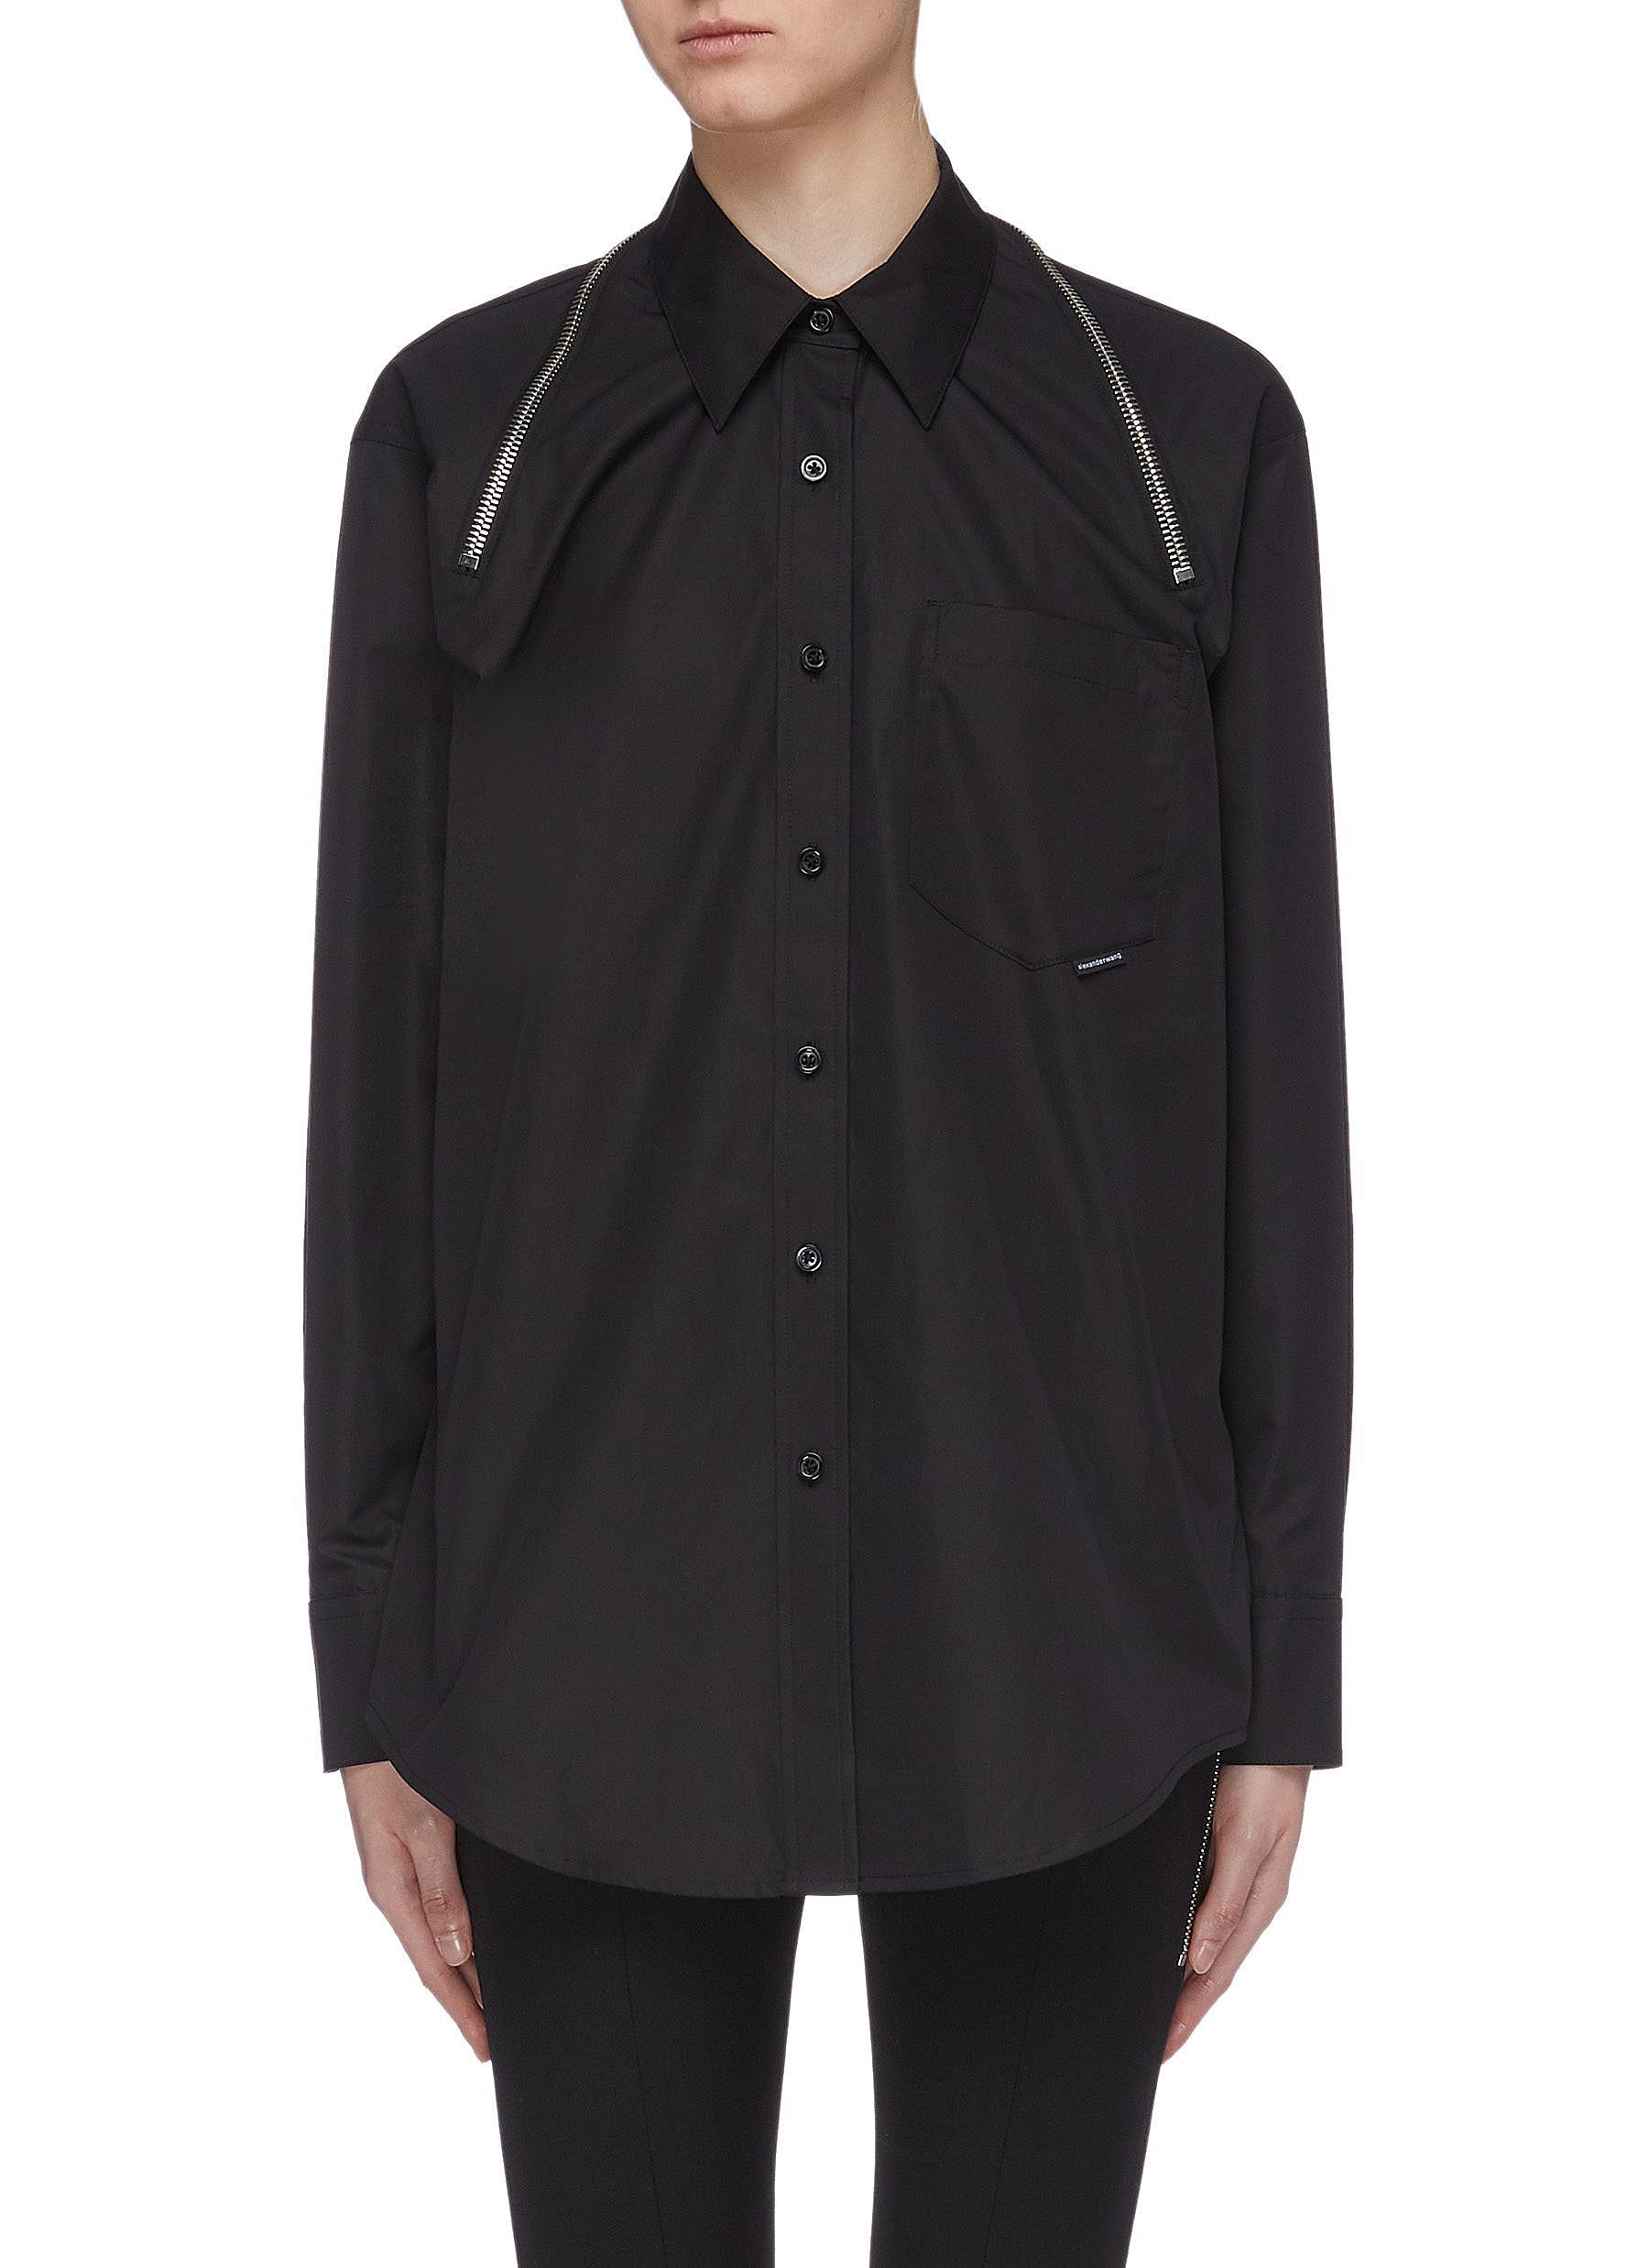 Zip shoulder shirt by Alexanderwang